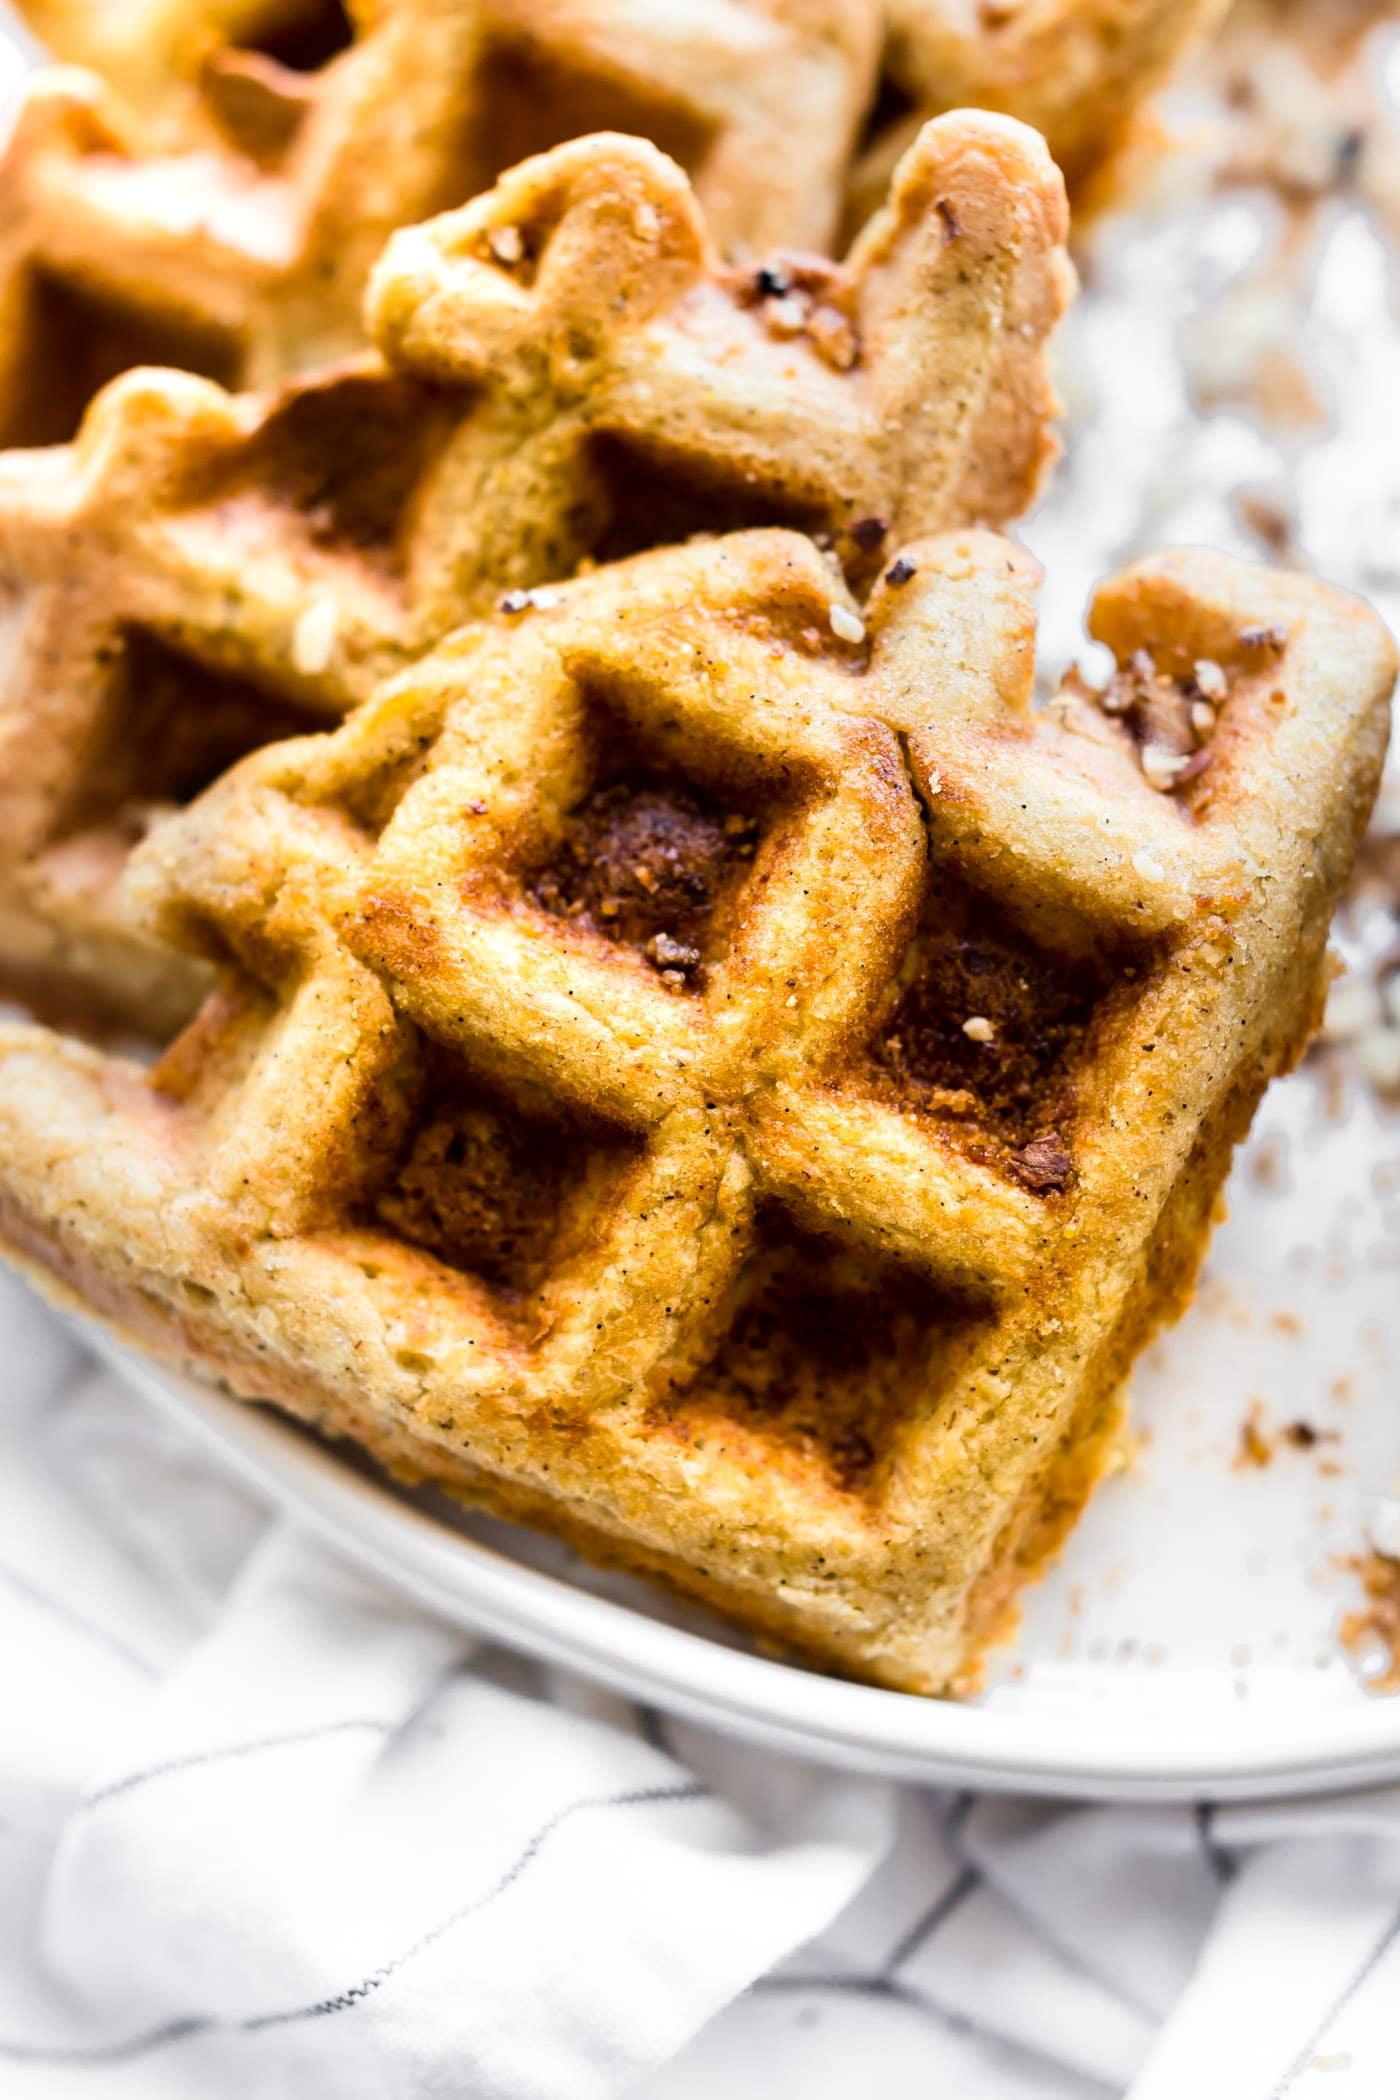 Overhead image of gluten free waffles.